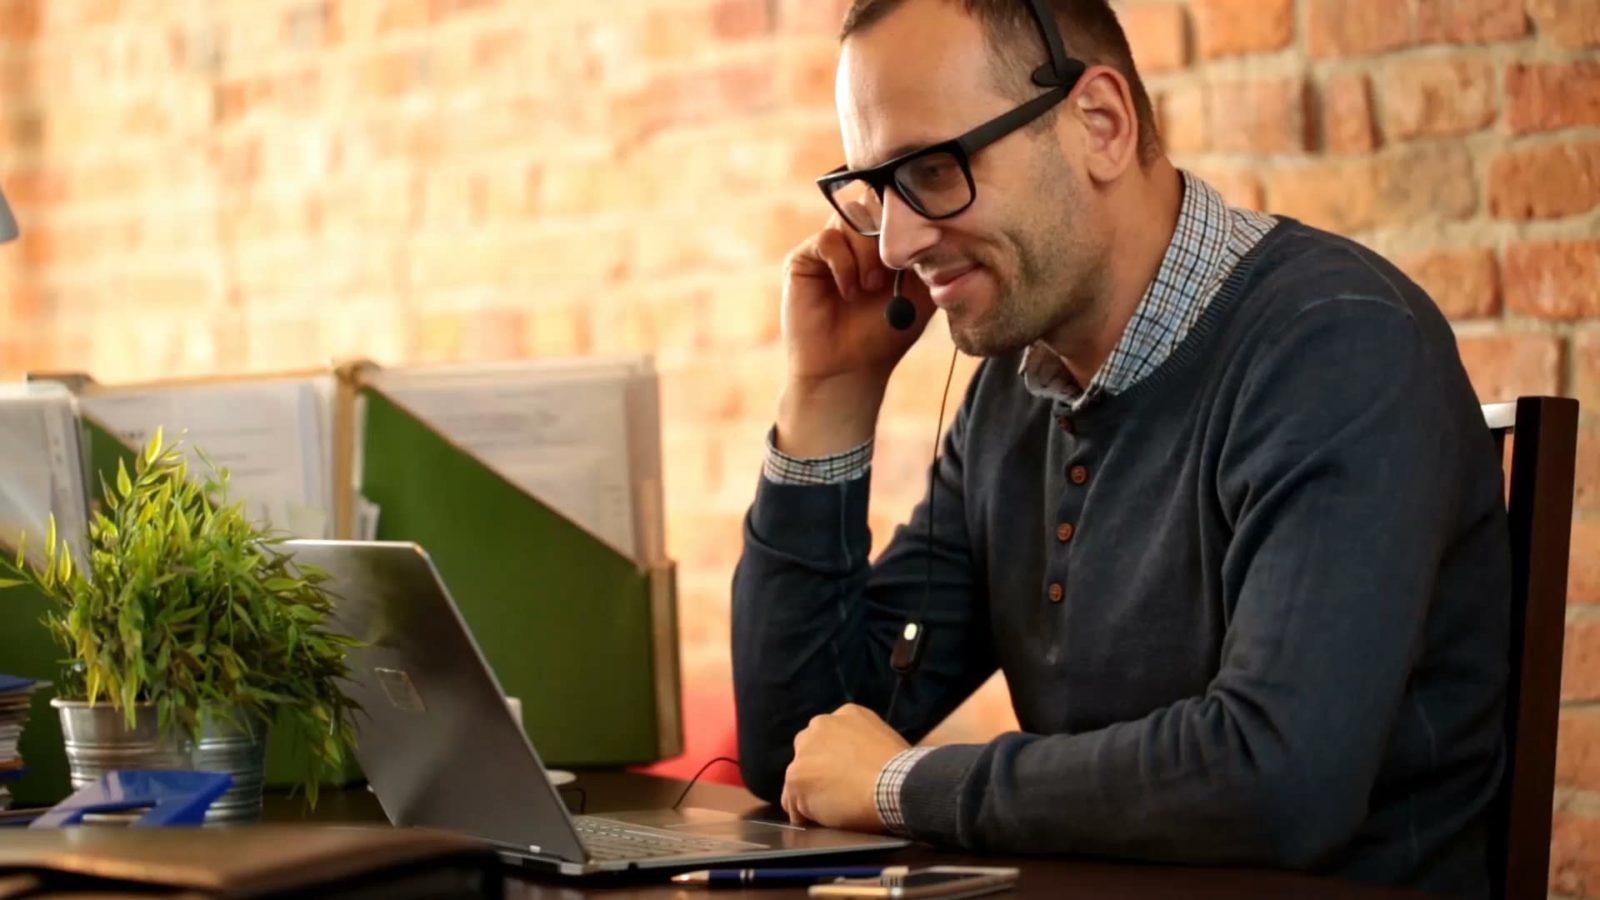 Sirope-Historias-Articulos-opinion-web-rentable-comunicar-clientes